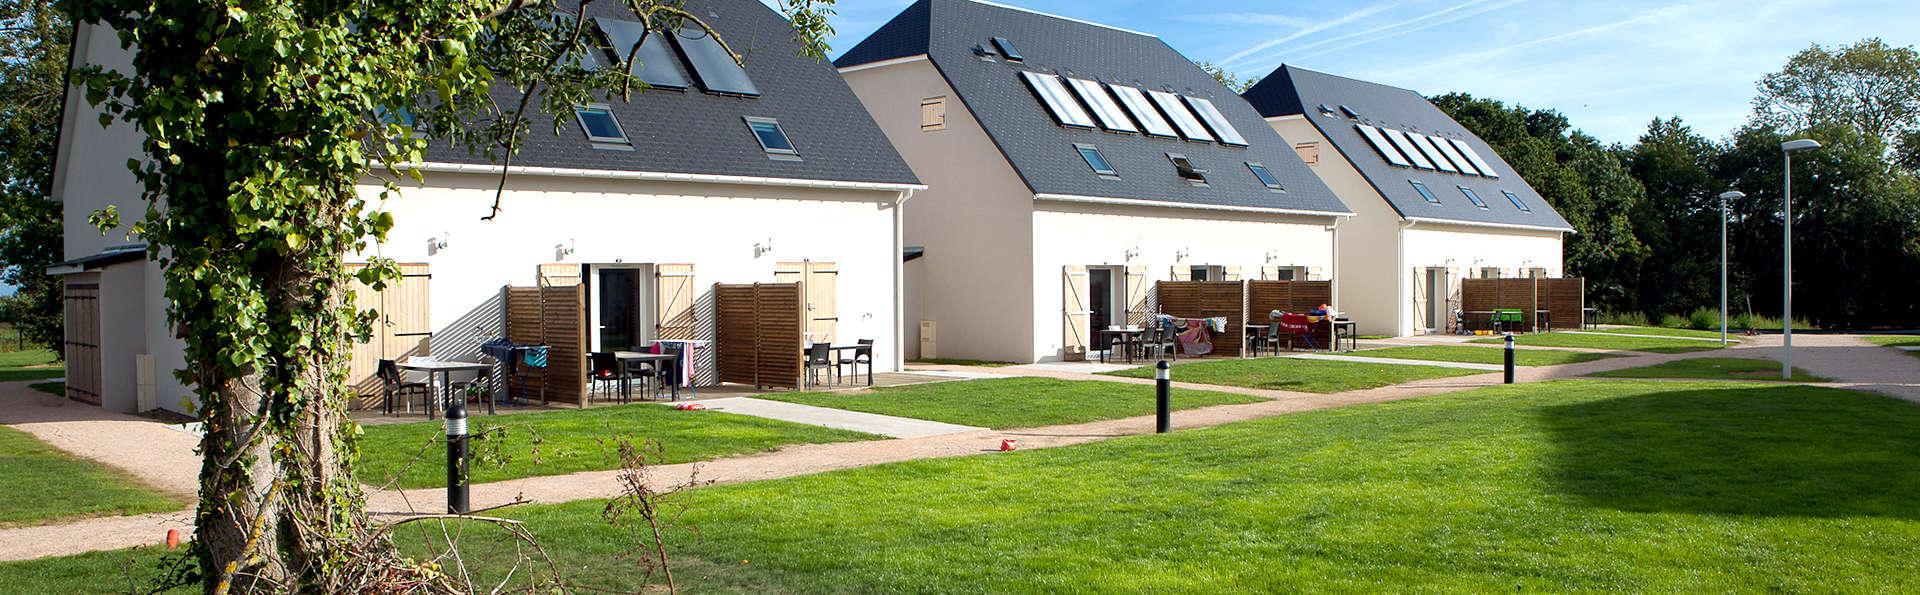 Vacanceole Domaine de la Corniche Deauville Sud - Edit_Front.jpg